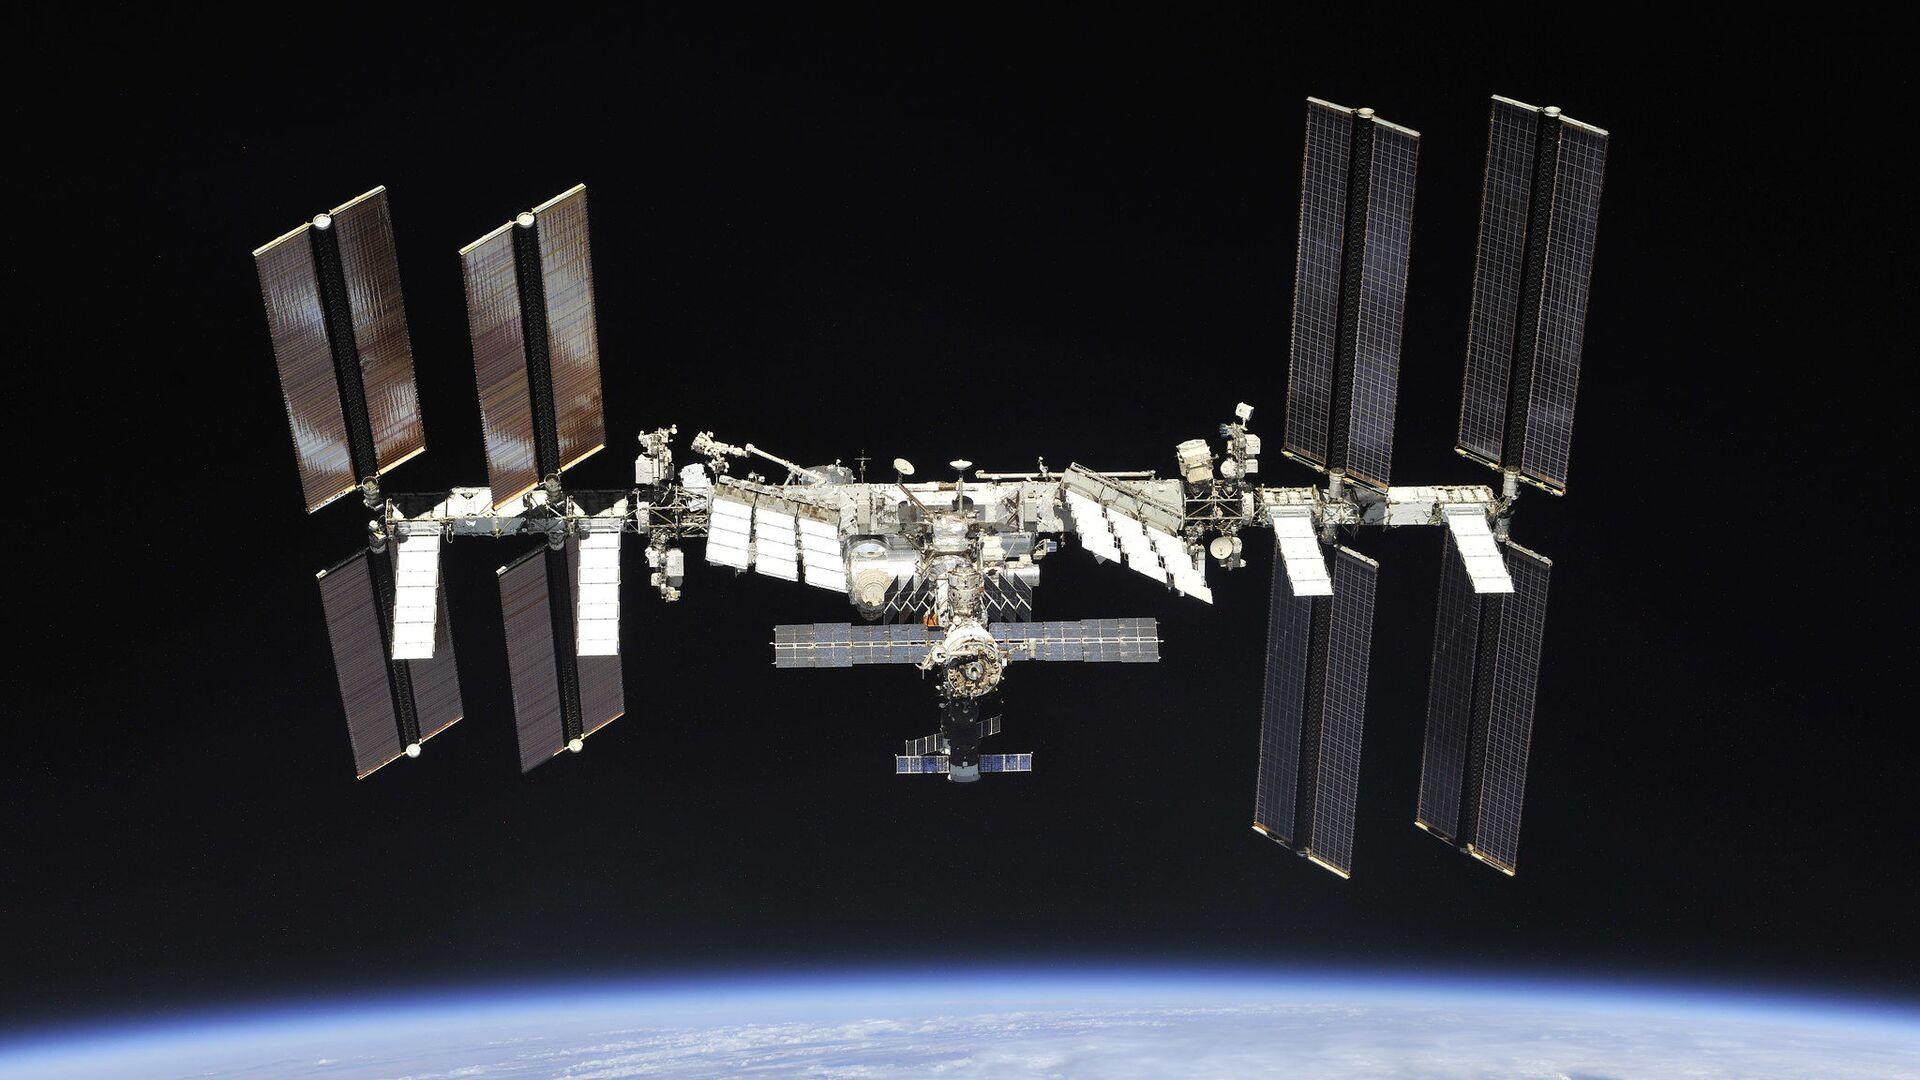 Estación Espacial Internacional (EEI) - Sputnik Mundo, 1920, 22.01.2021